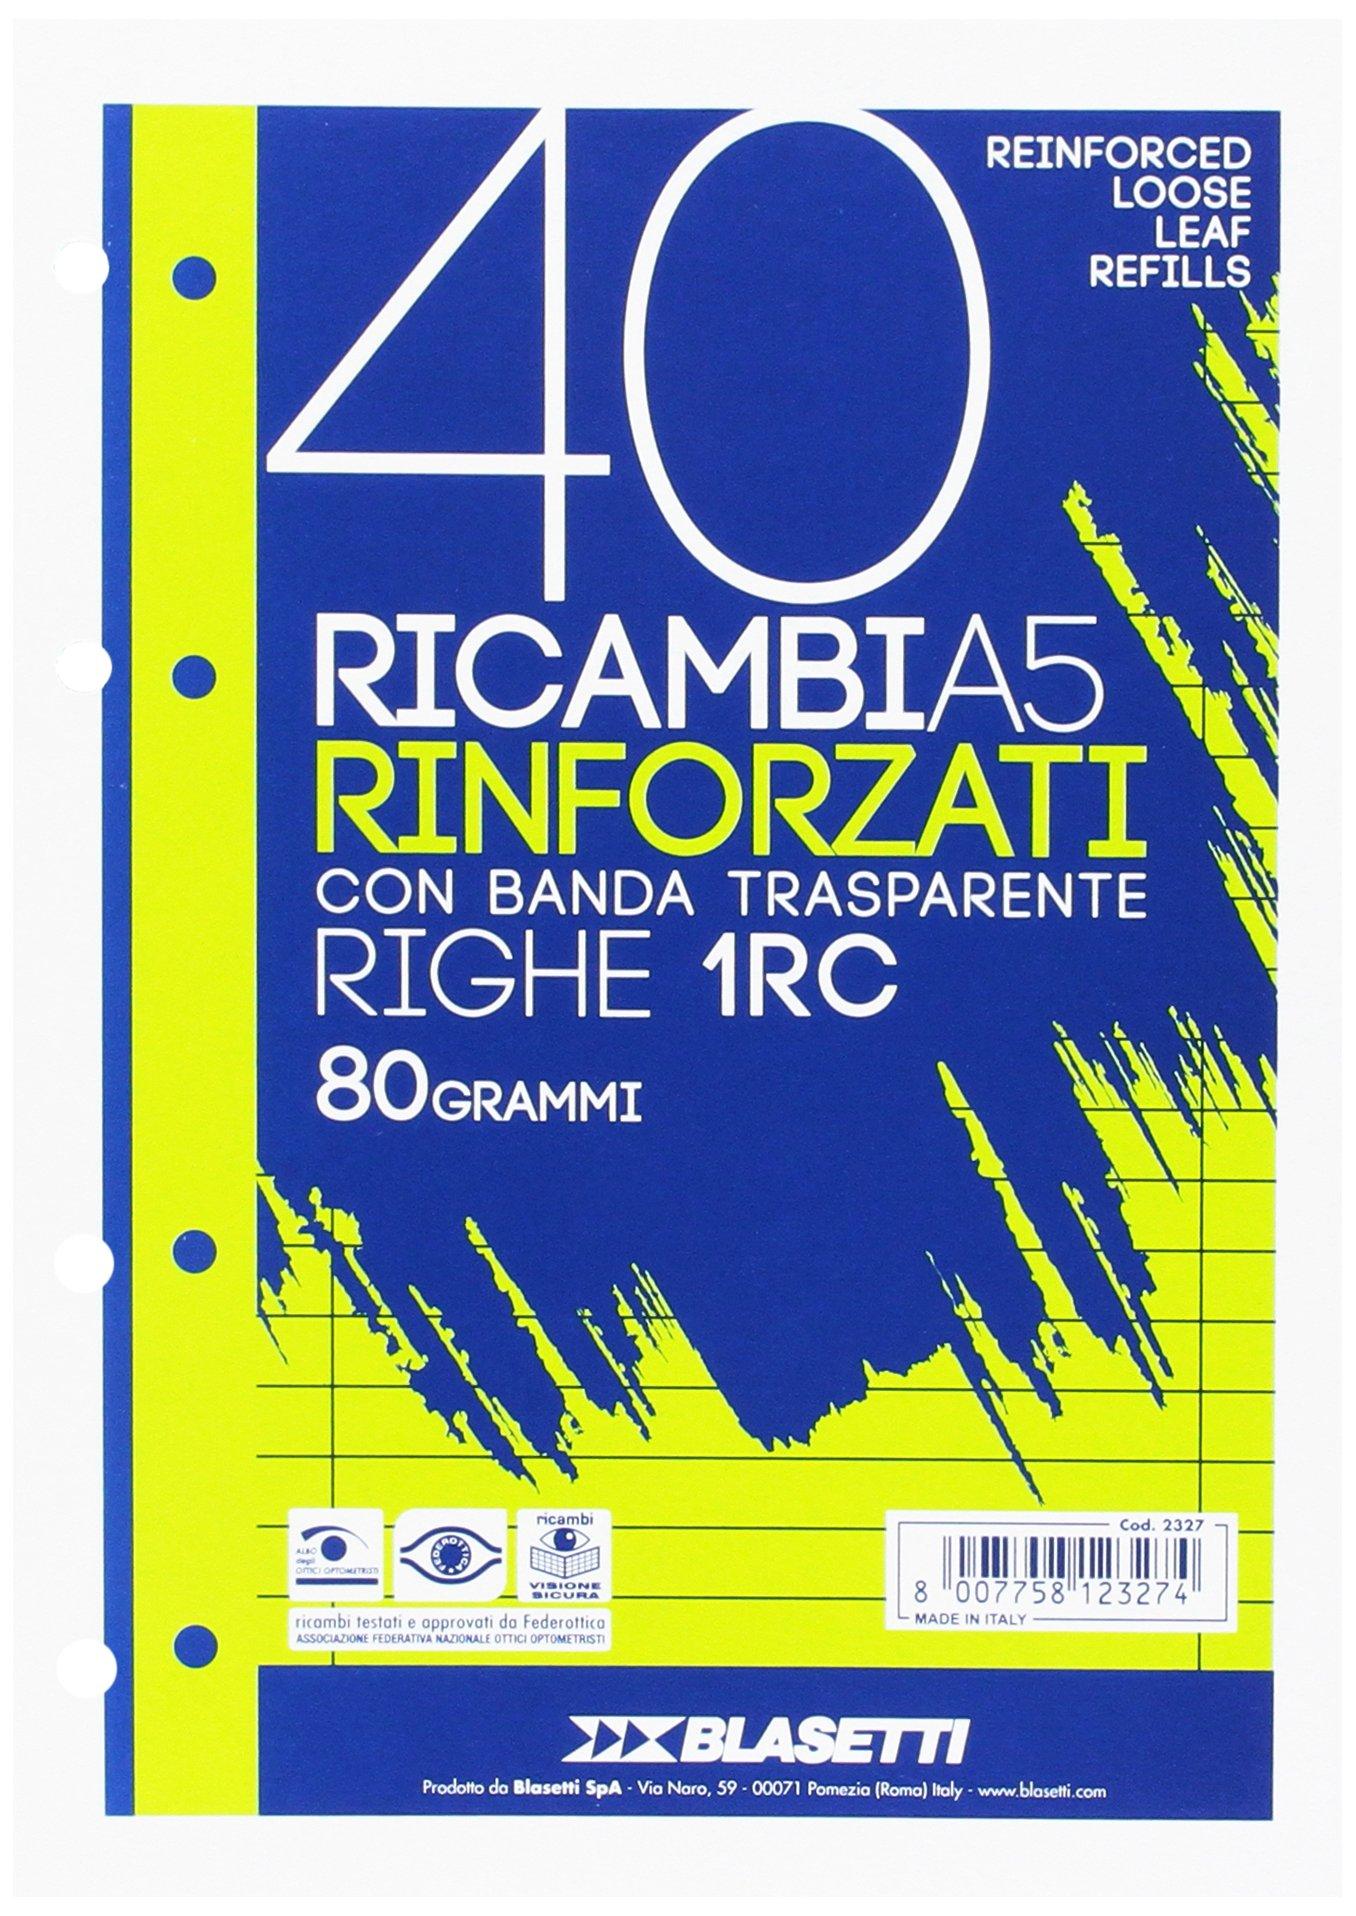 RICAMBI A5 RIGHE 1RC 40FF